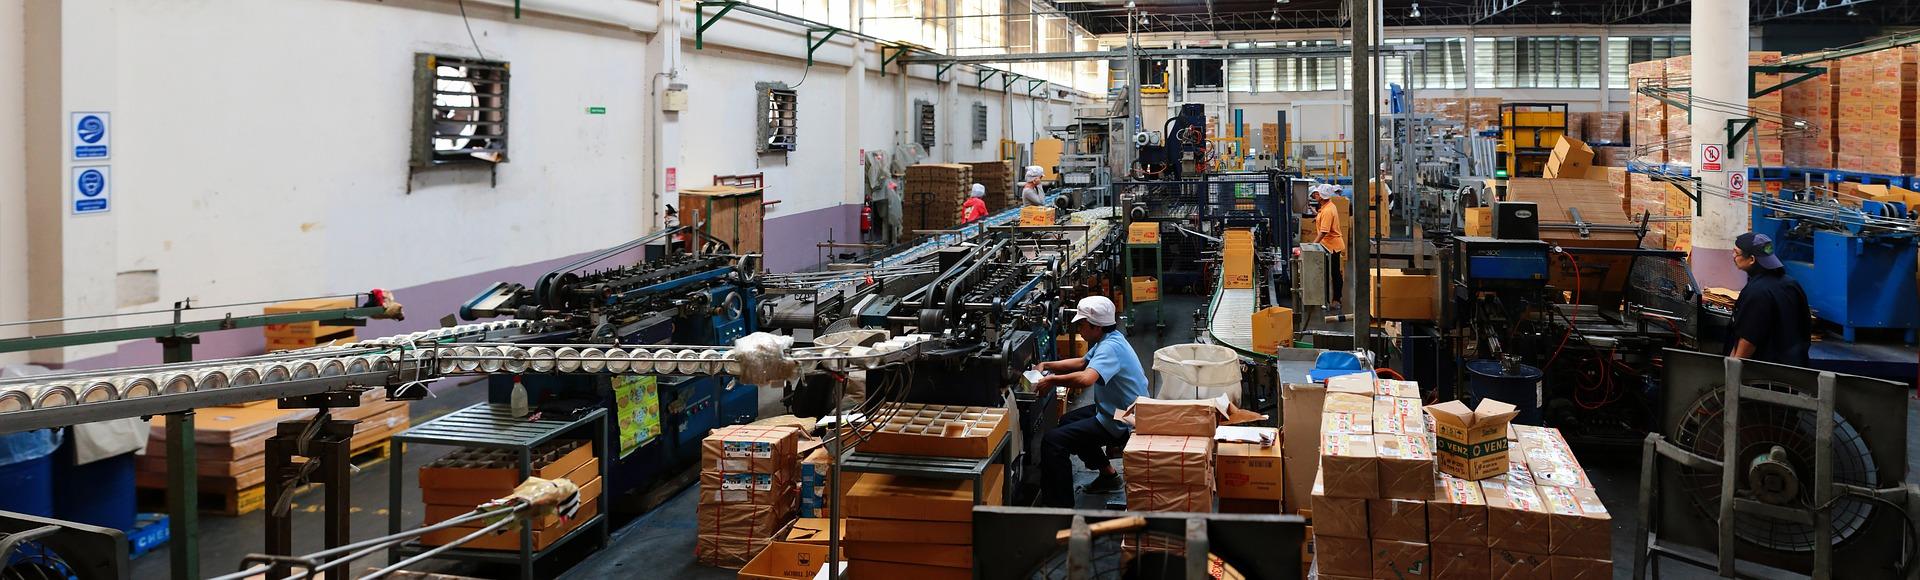 factory-722863_1920.jpg